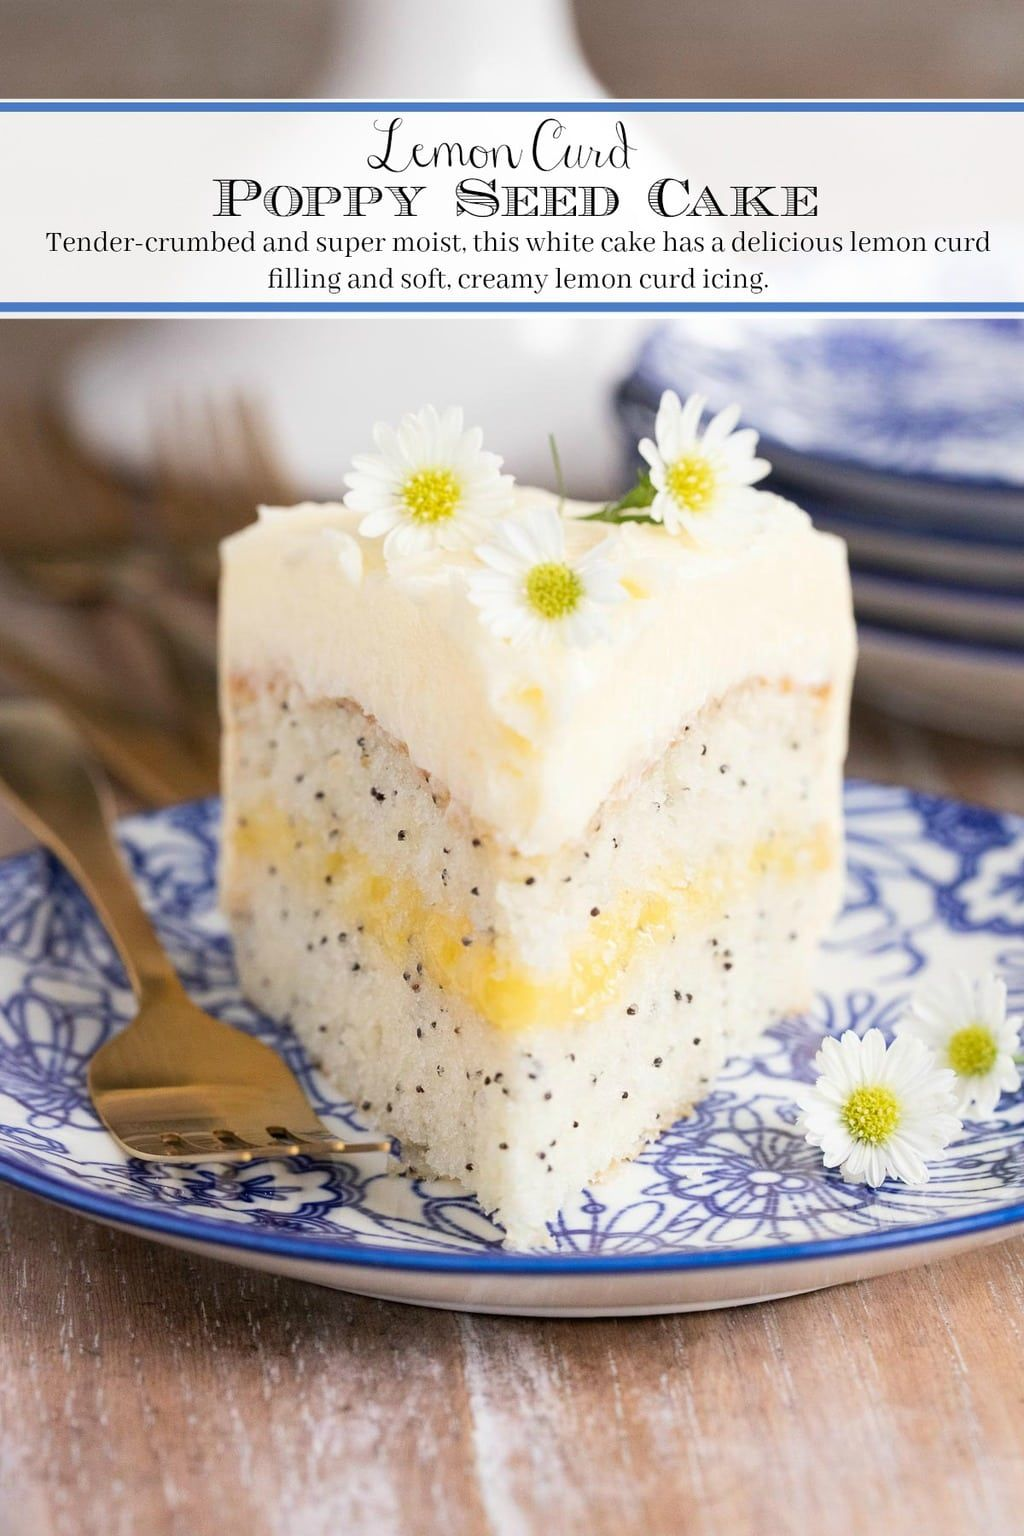 Photo of Lemon Curd Poppy Seed Cake